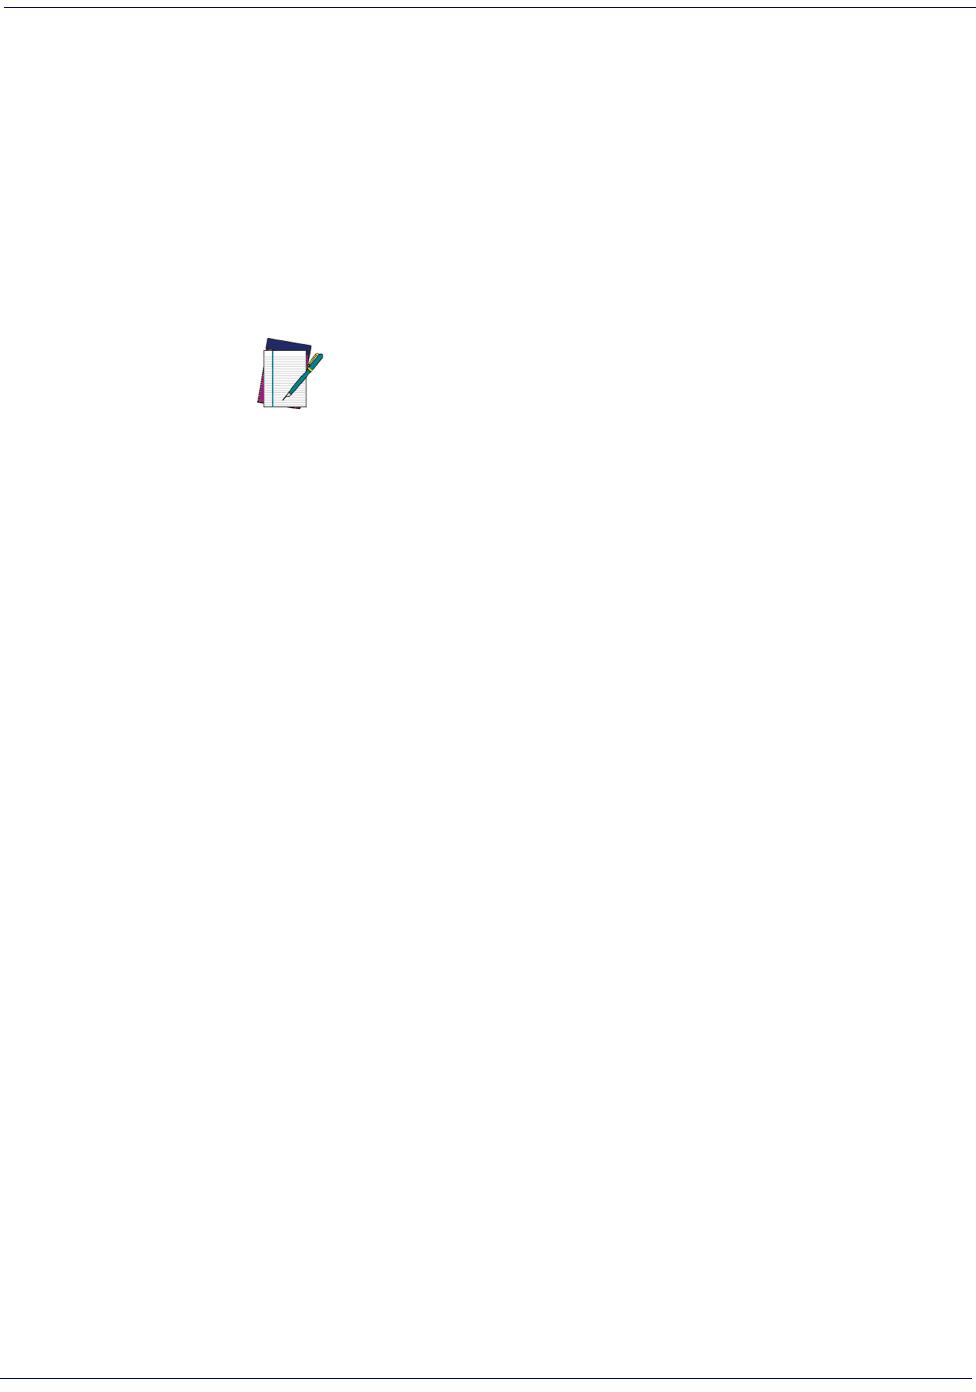 Handleiding Datalogic Quickscan Lite Qw2100 Pagina 19 Van 324 Barcode Scanner Linear Imager English